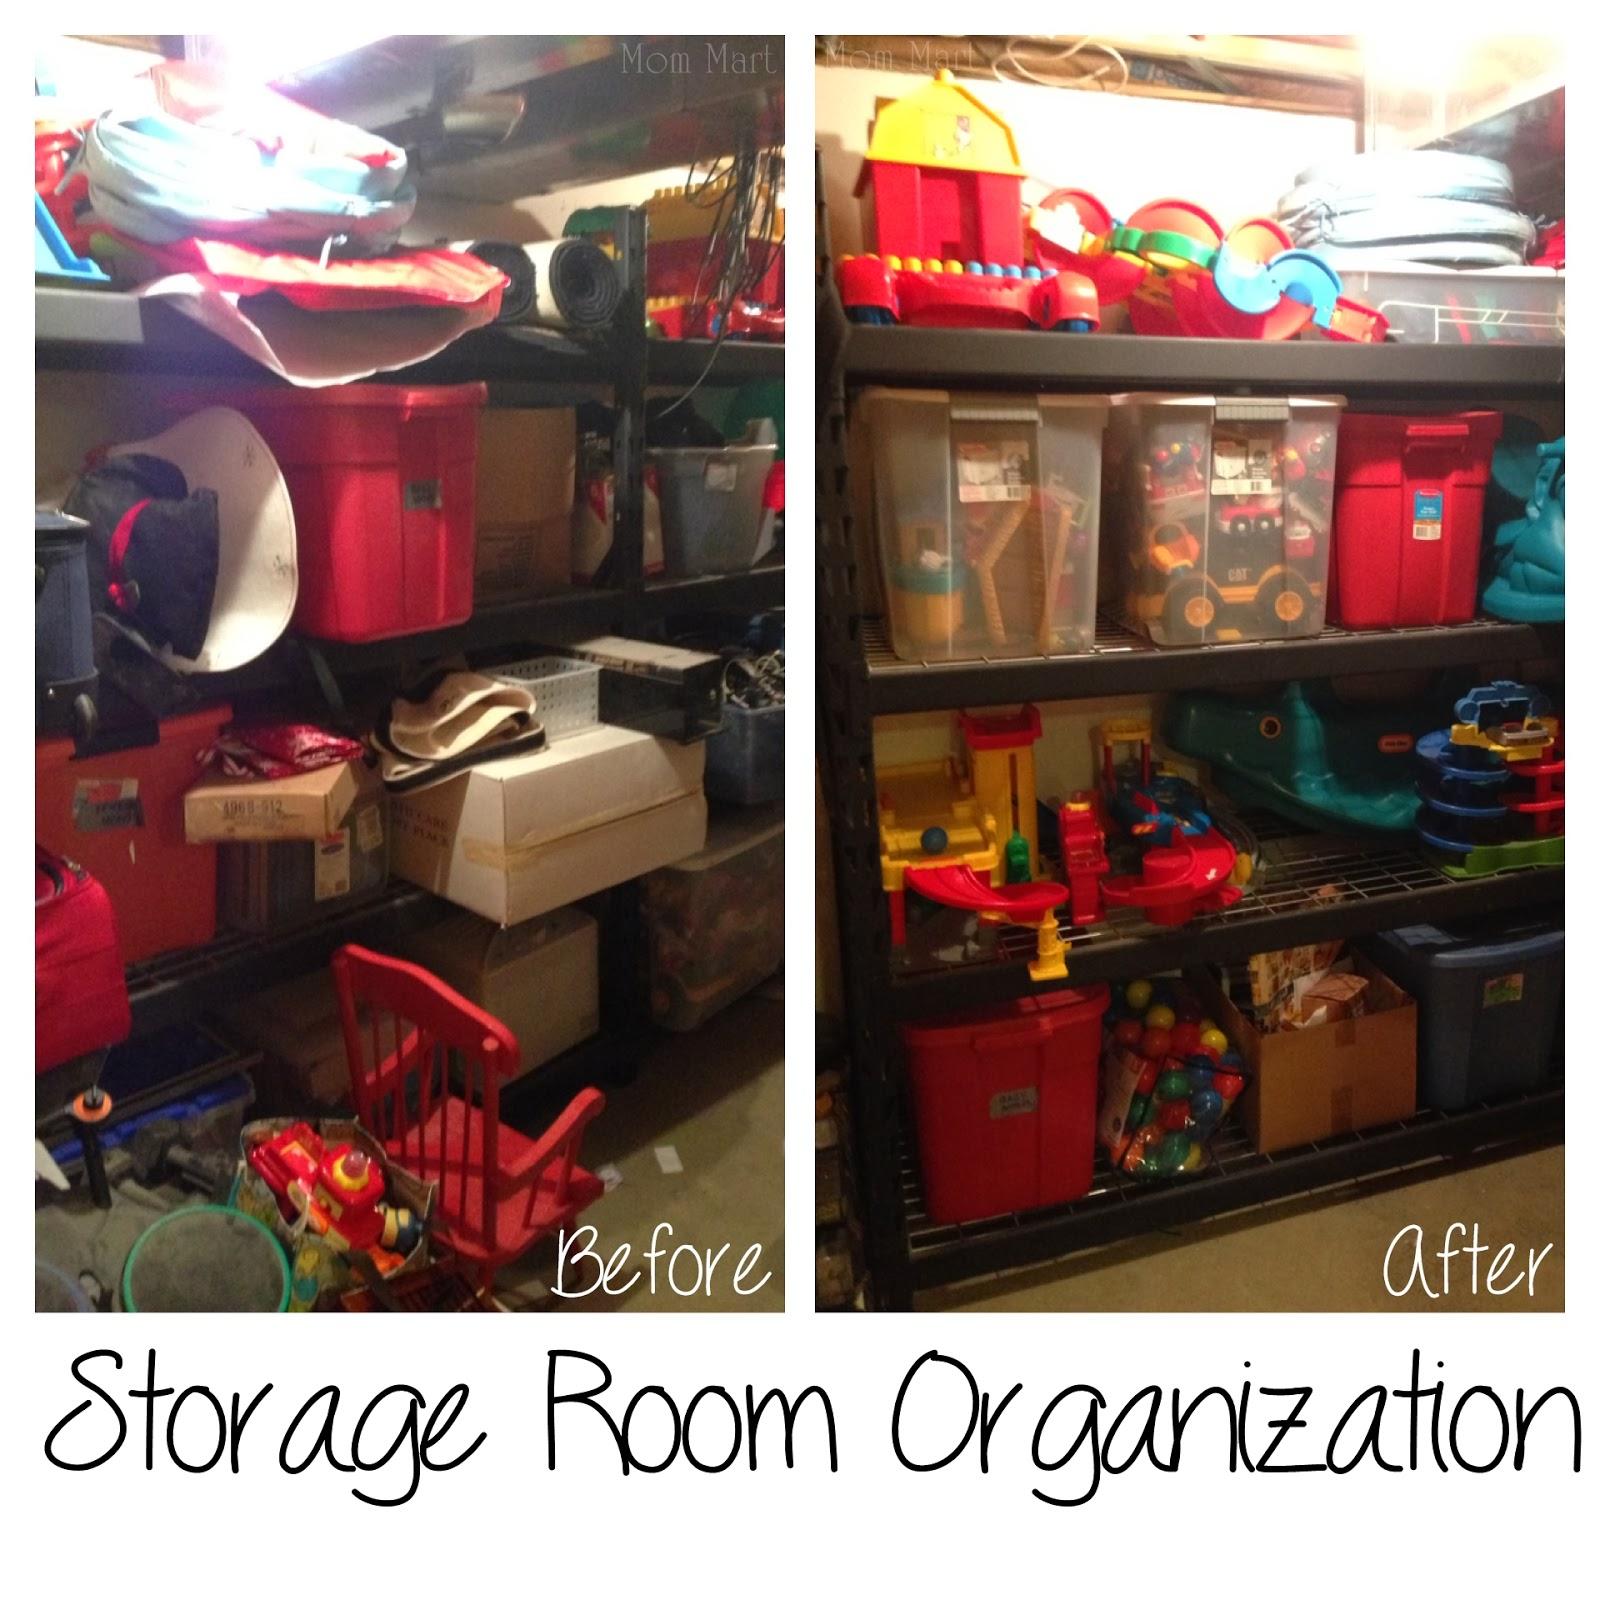 Storage Room Organization for Toy Rotation